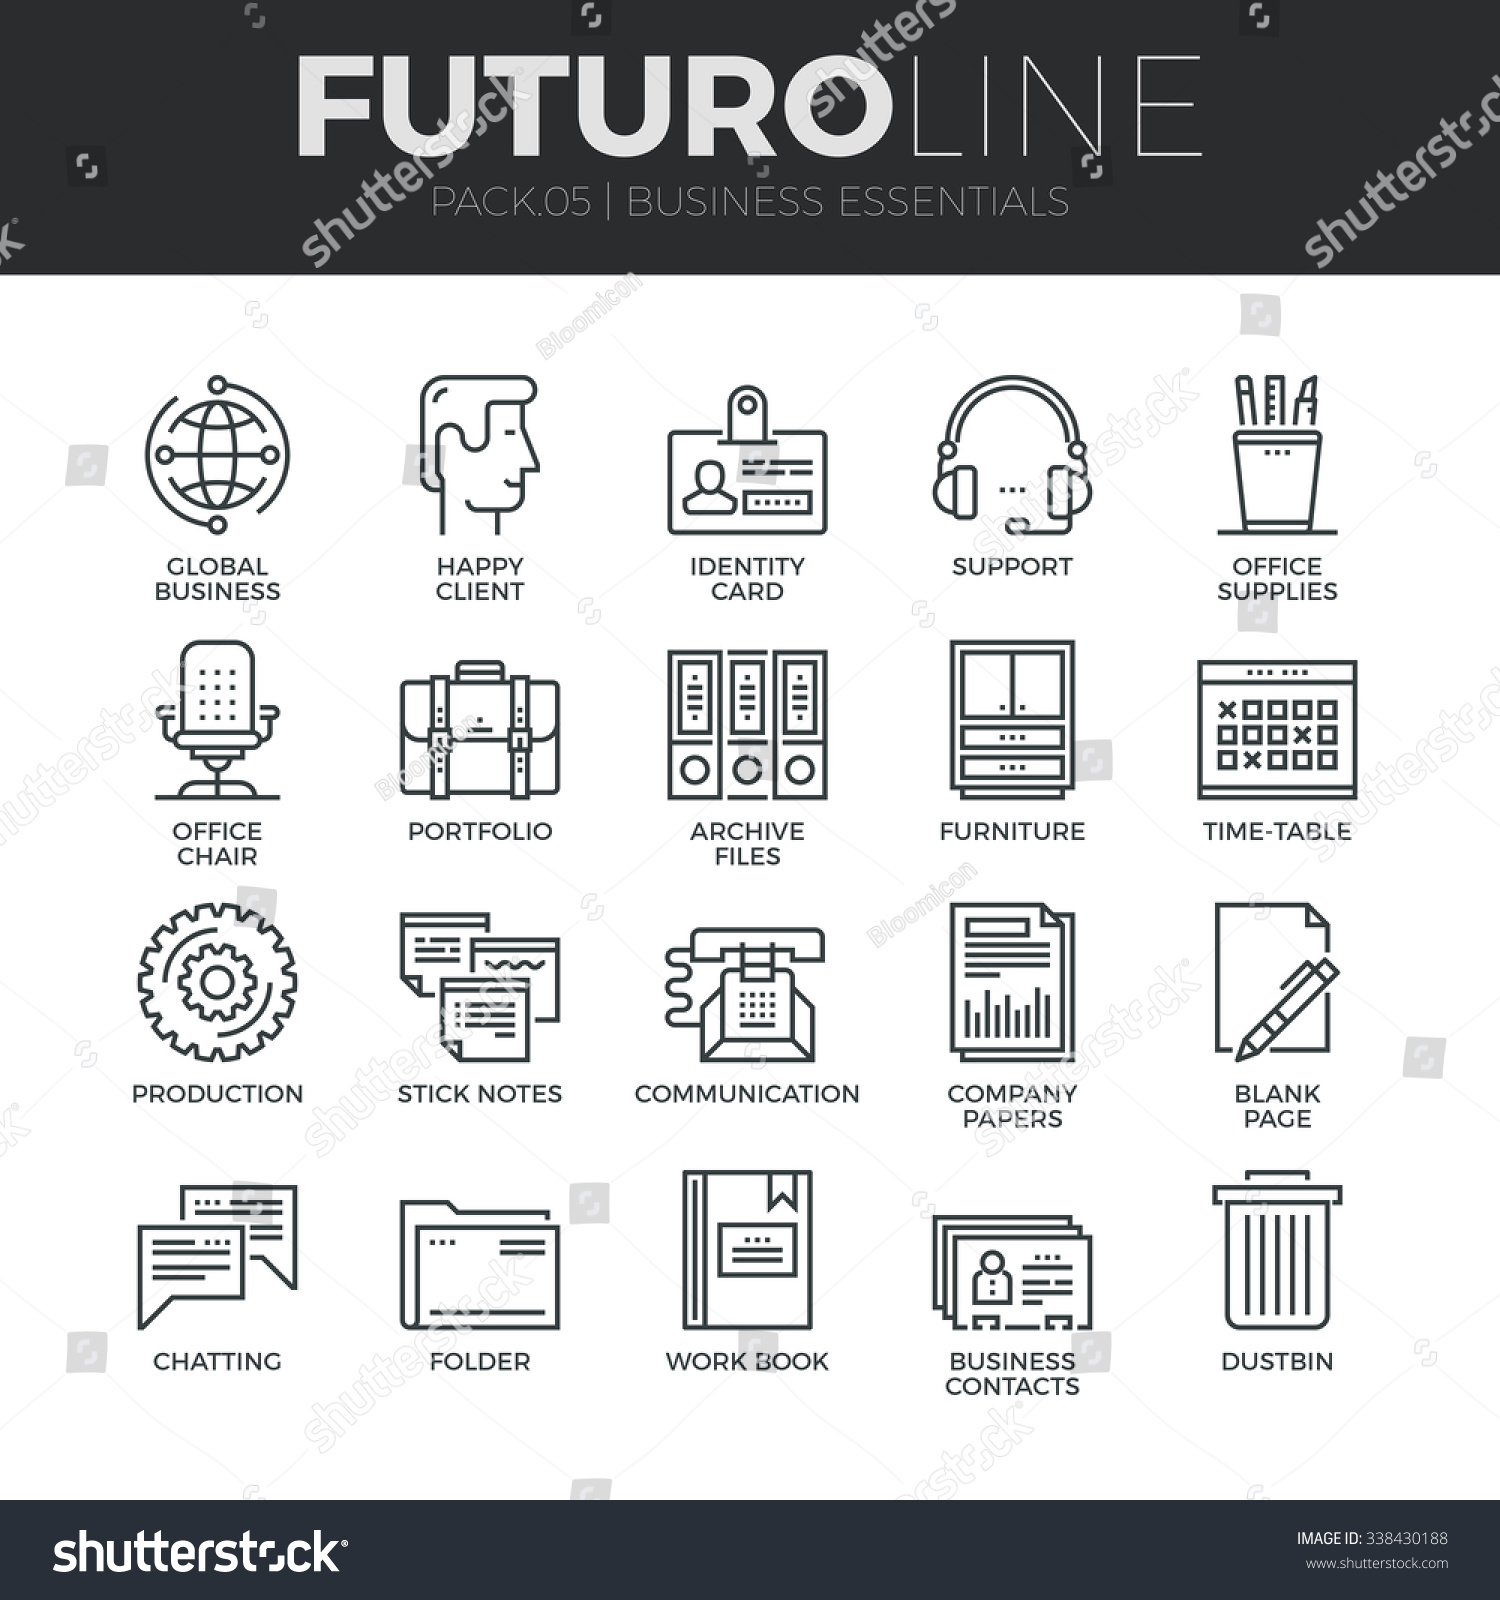 Office Equipment List 83405 | SITWEB